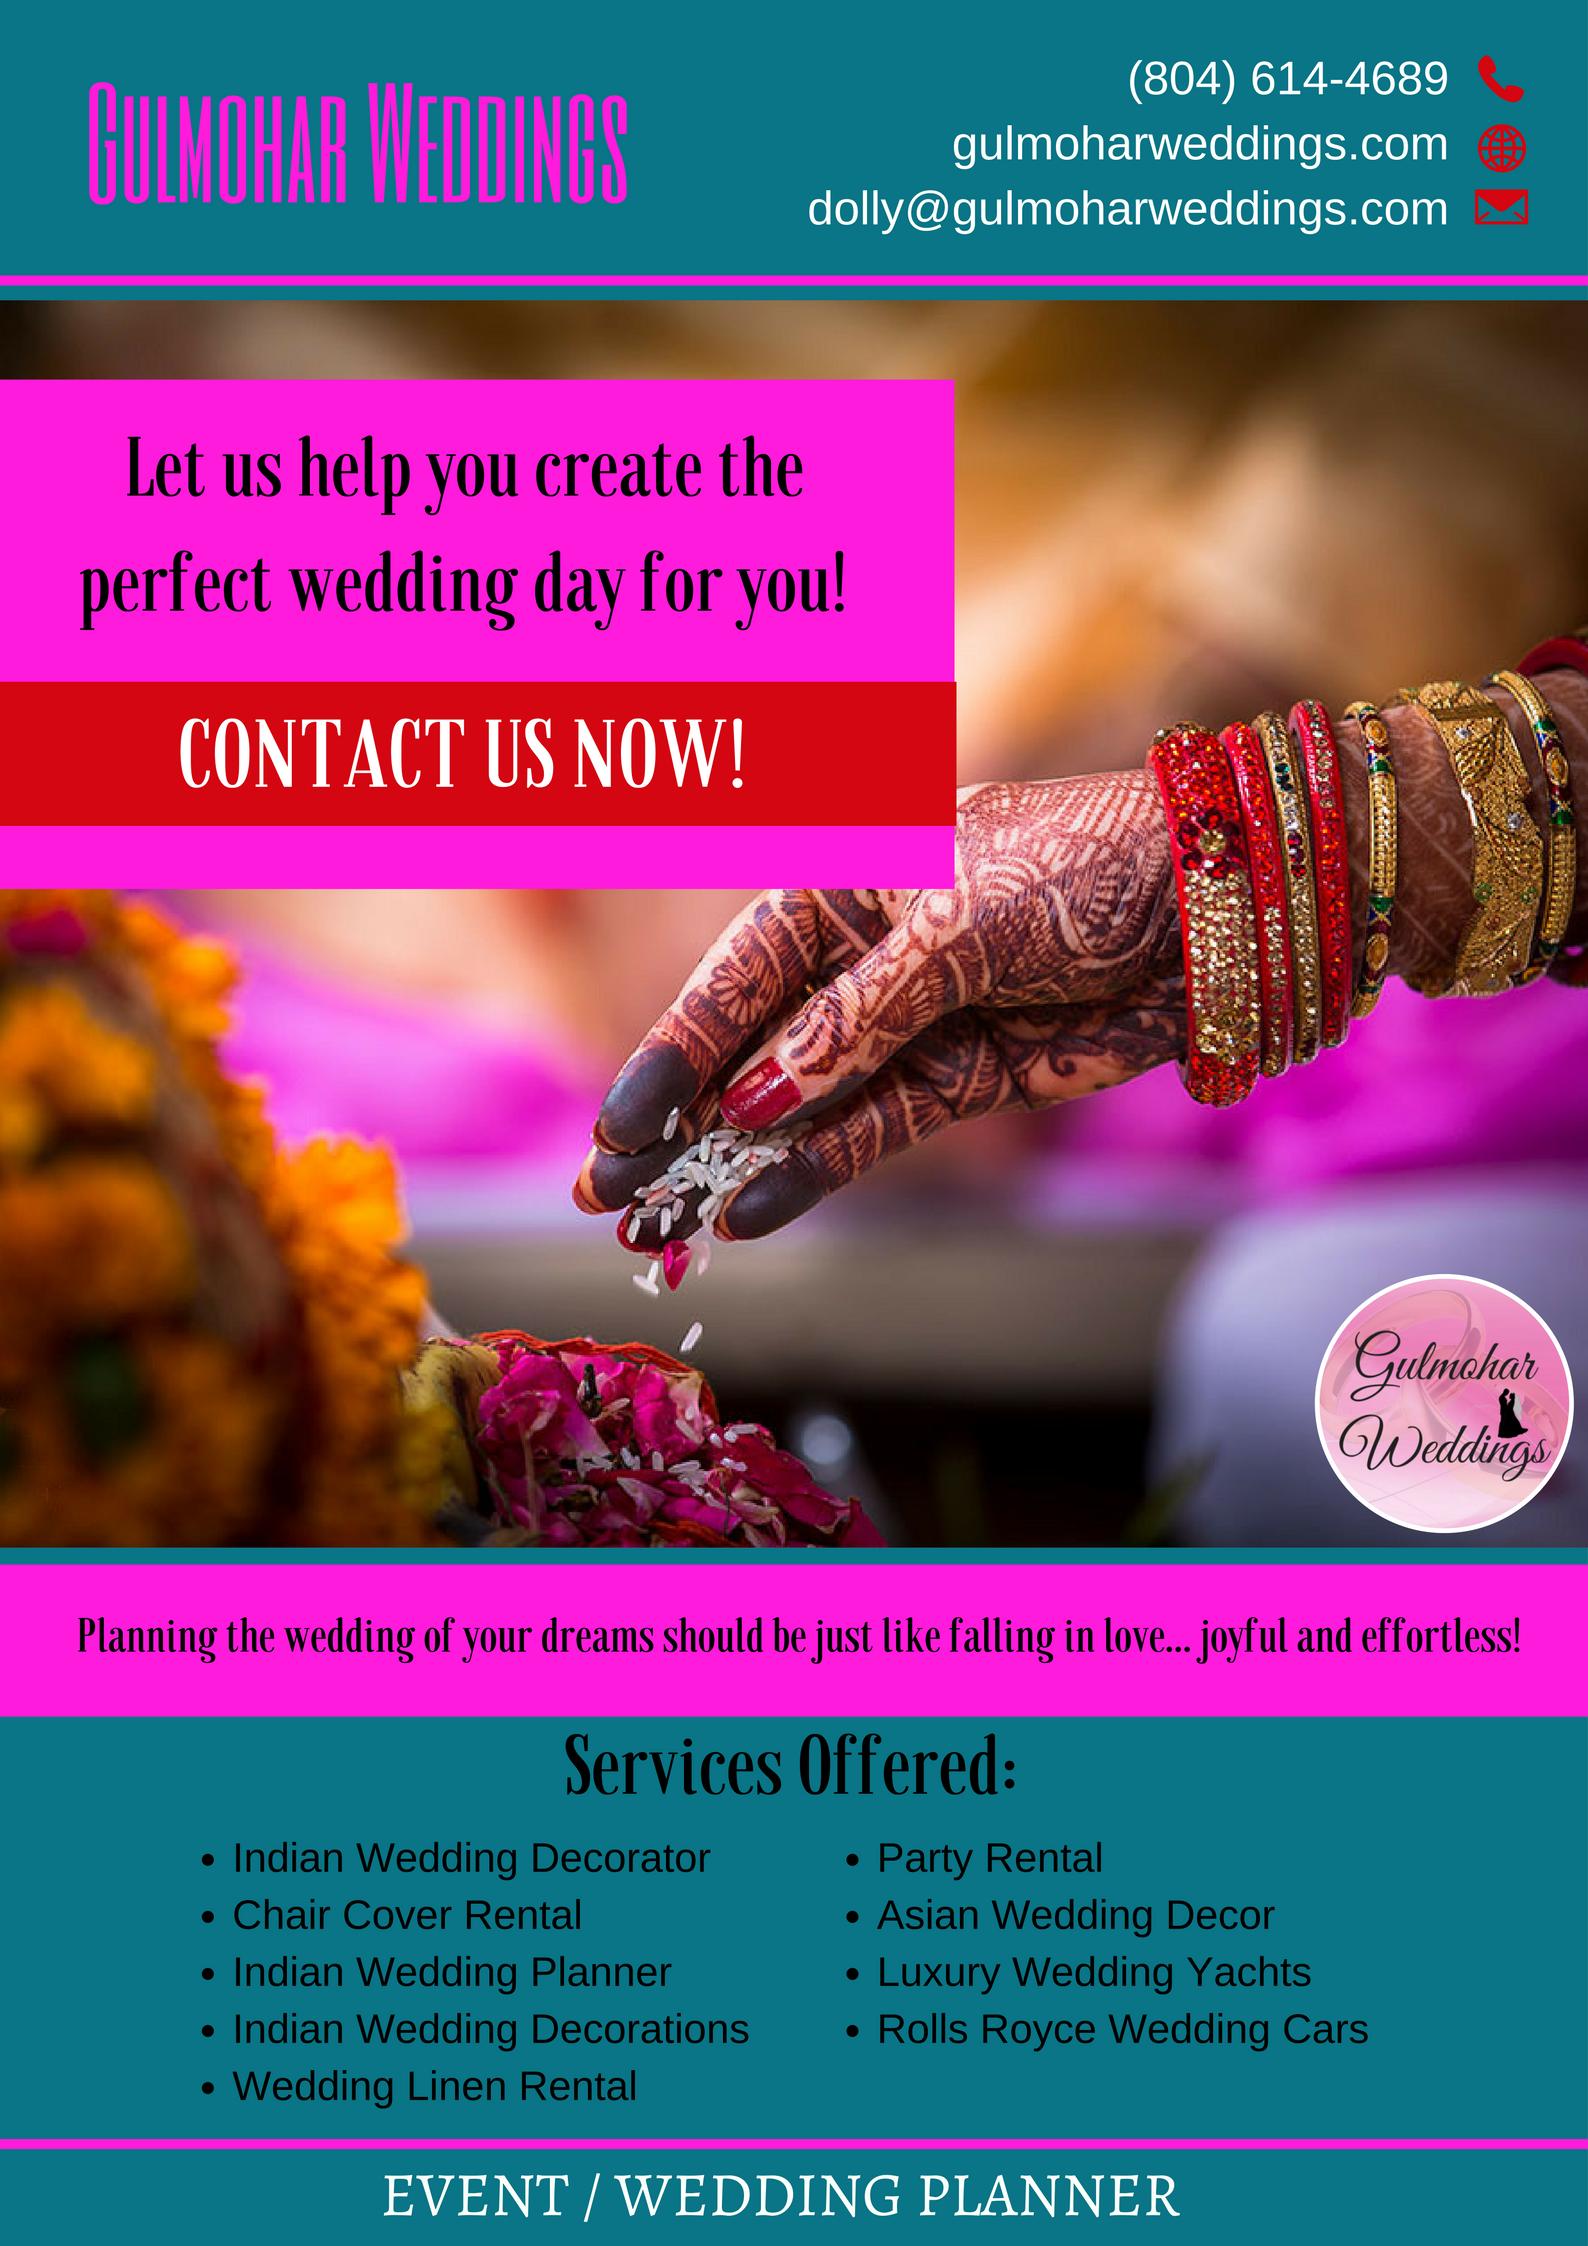 Services Offered Indian Wedding Decorator In Richmond Va Indian Wedding Decorator In Virgi Beach Wedding Locations Asian Wedding Decor Michigan Wedding Venues